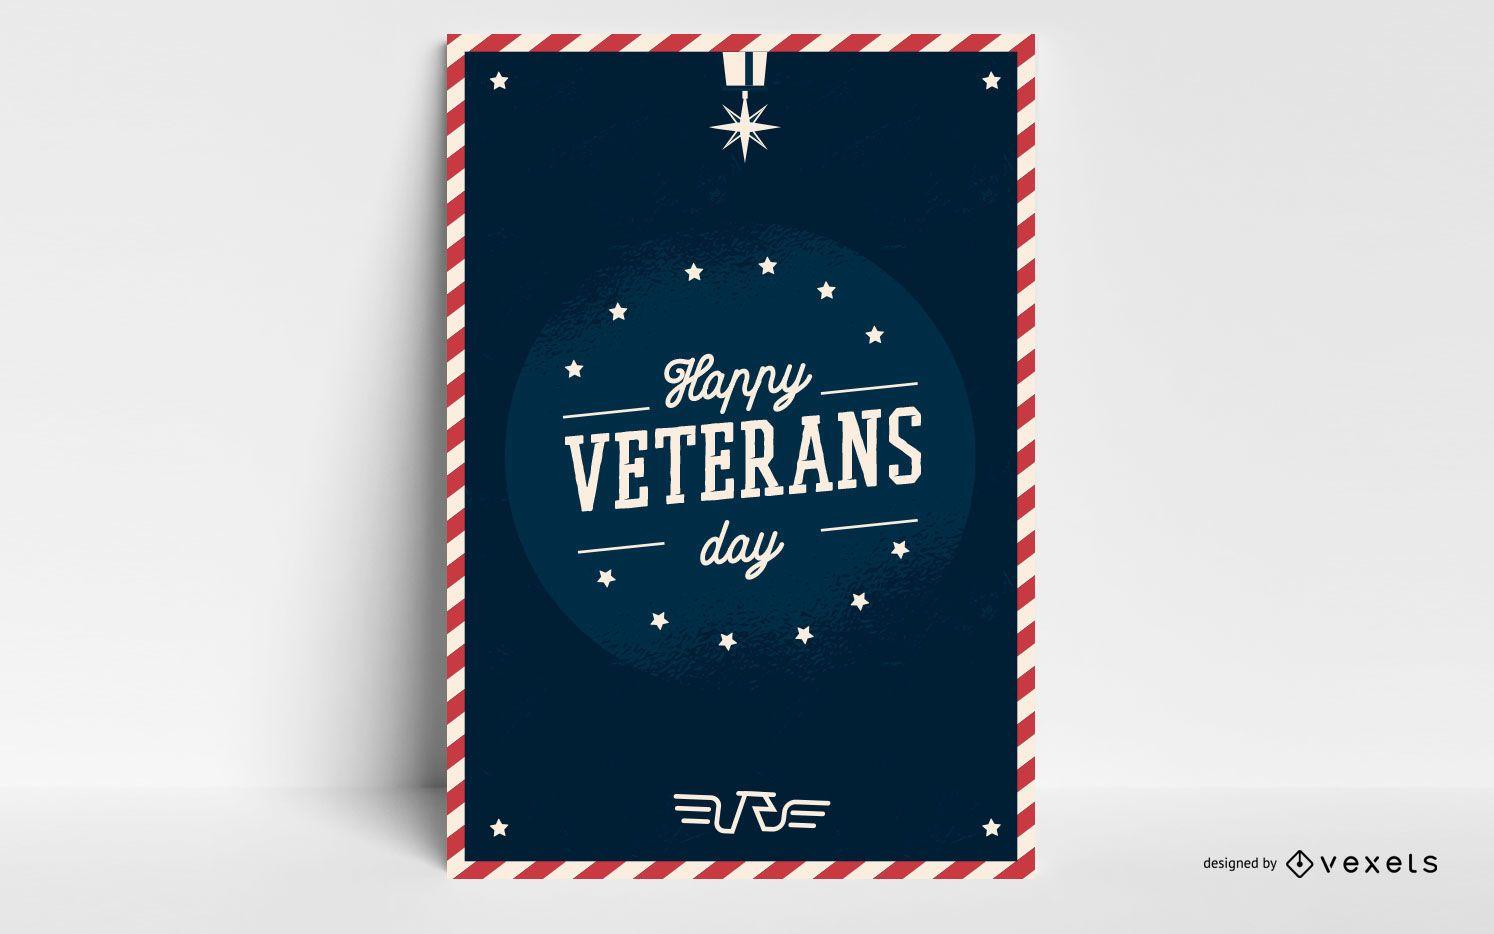 Happy veterans day poster